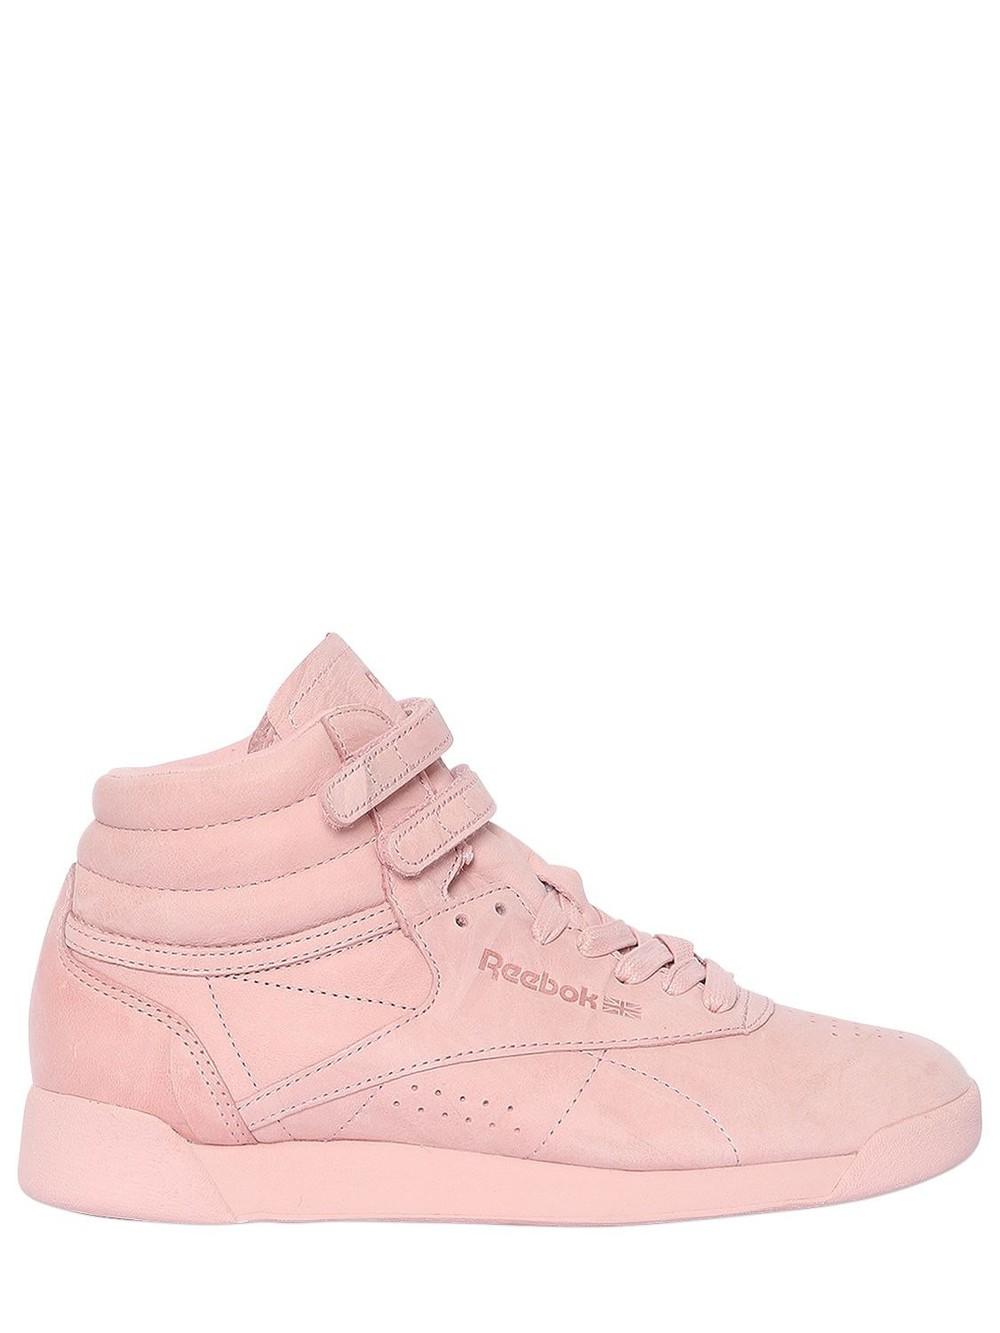 REEBOK CLASSICS Freestyle Nubuck High Top Sneakers in pink